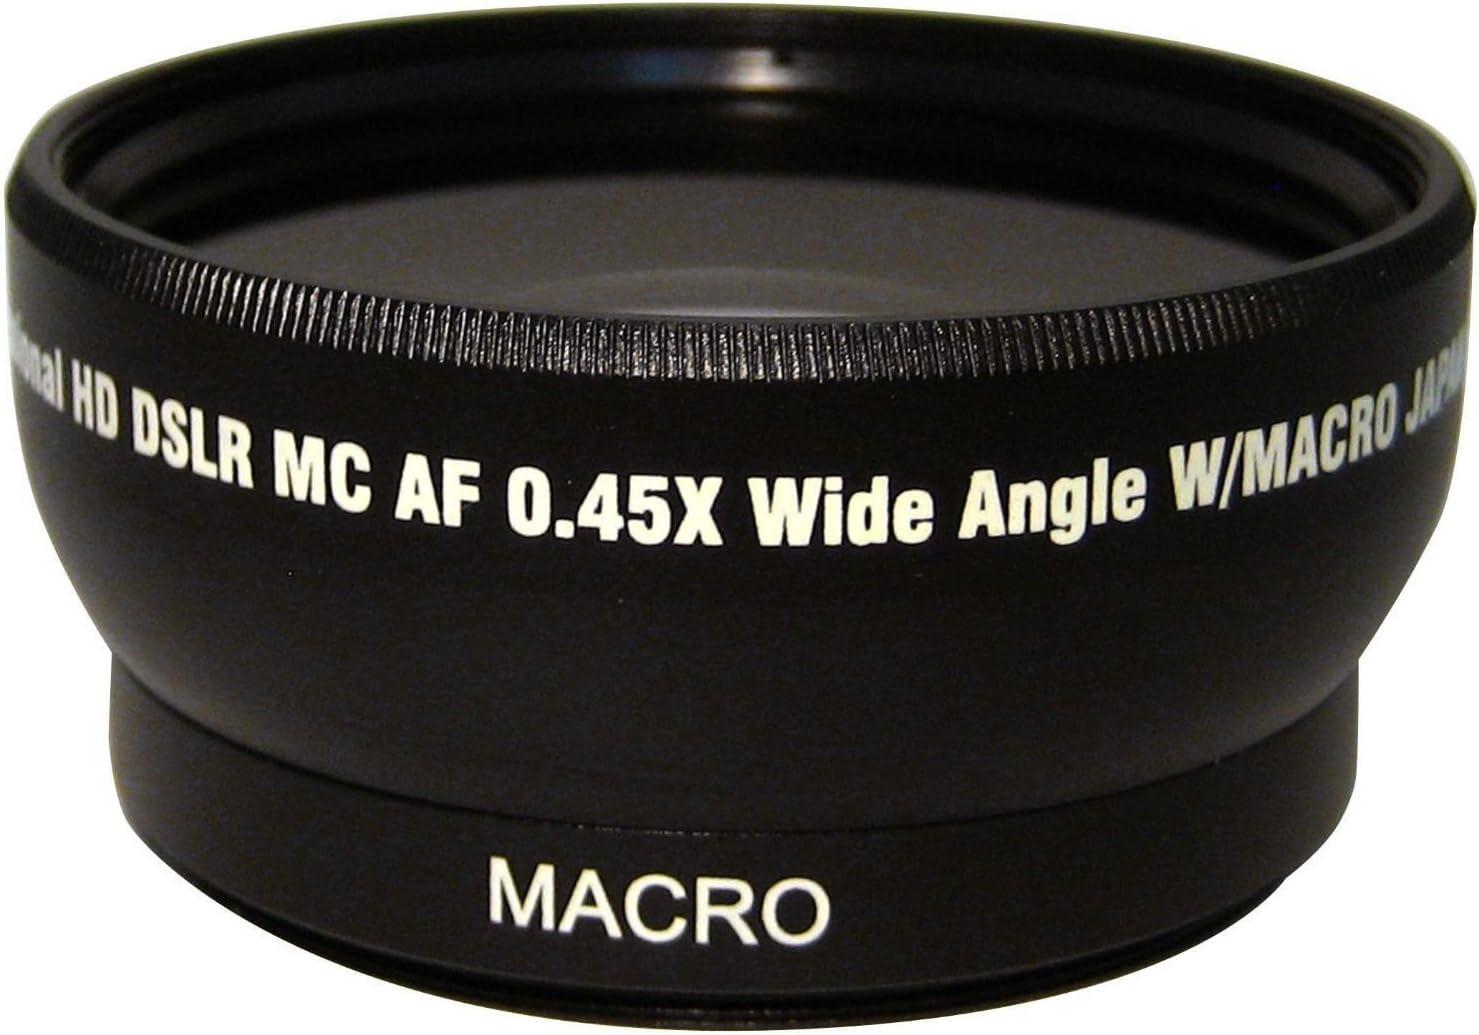 HD Wide Angle w//Macro Lens PANASONIC DMC-FZ35 DMC-FZ38 58mm Compatible, Tube Adapter Not Included